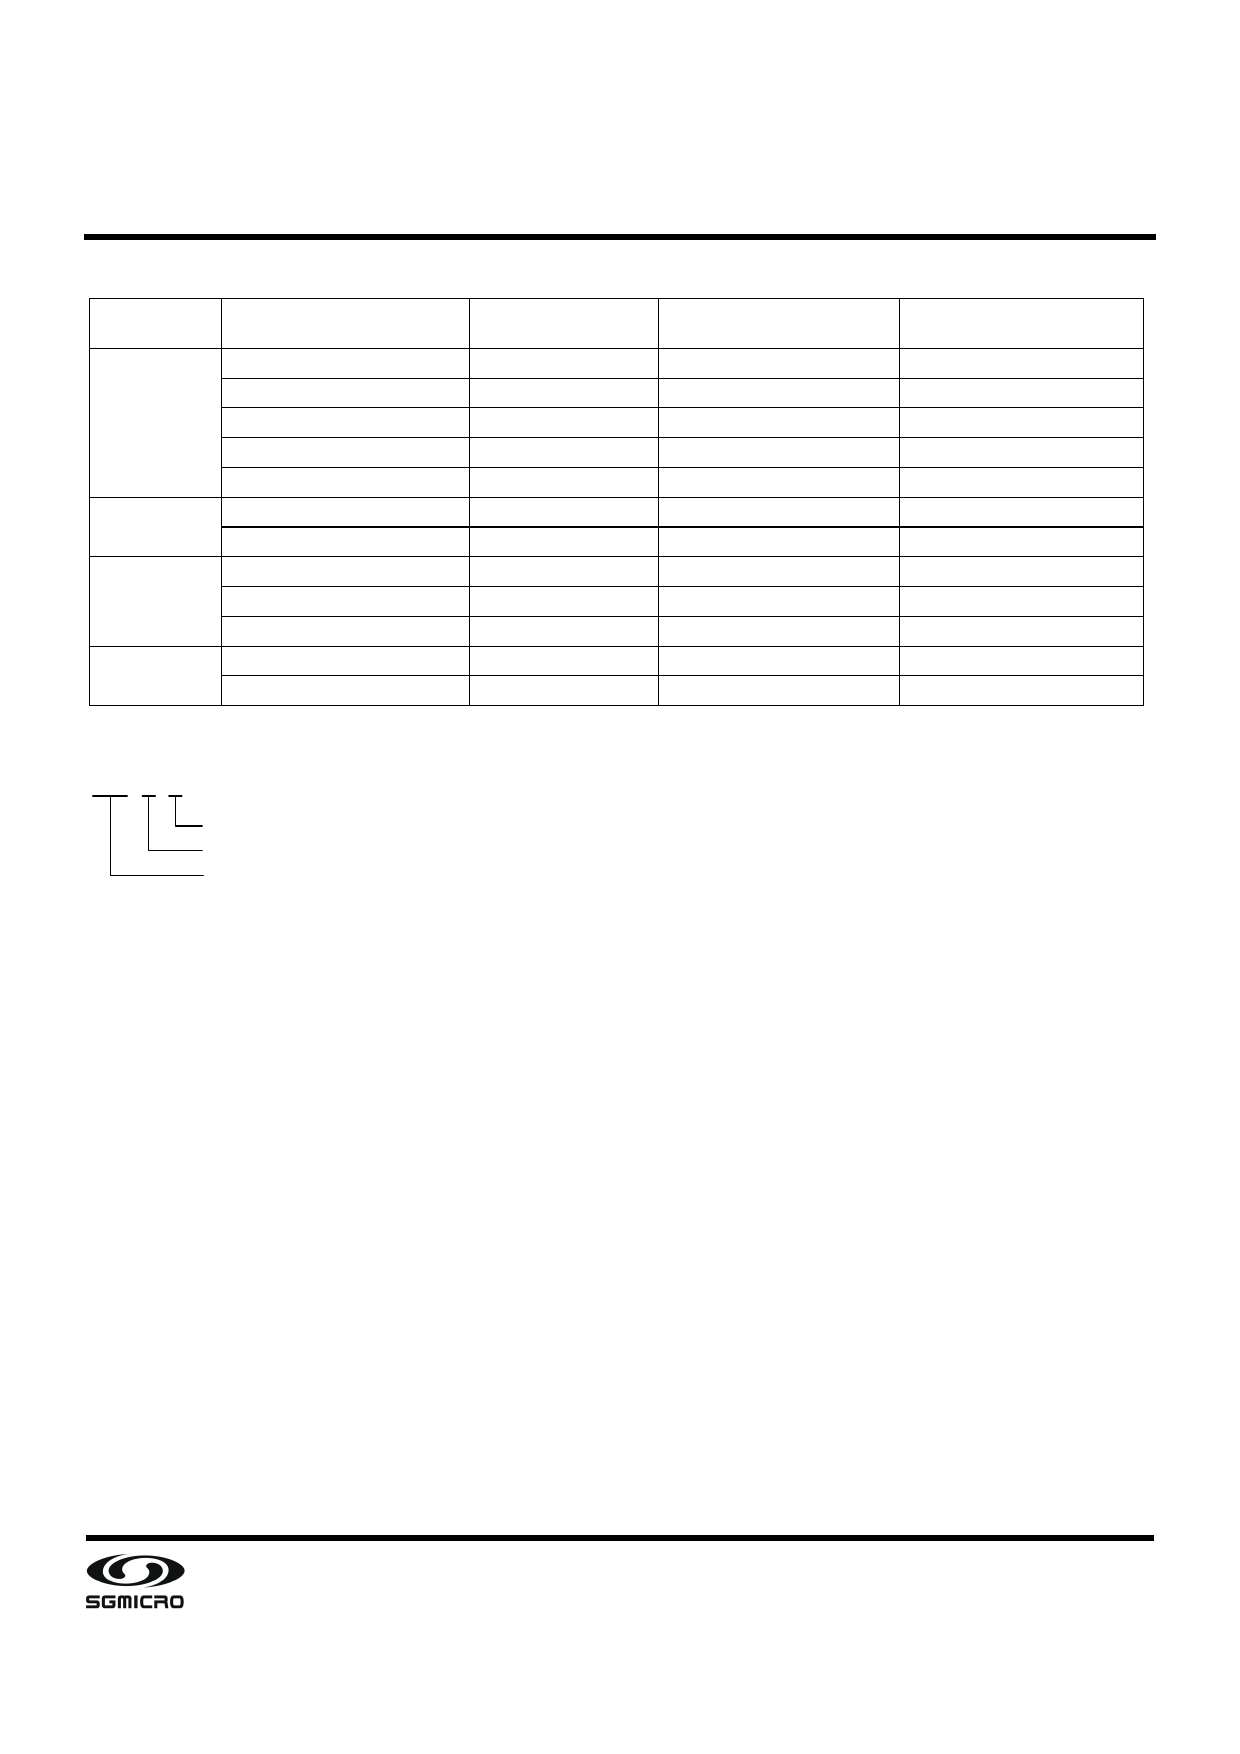 SGM8933 pdf, schematic